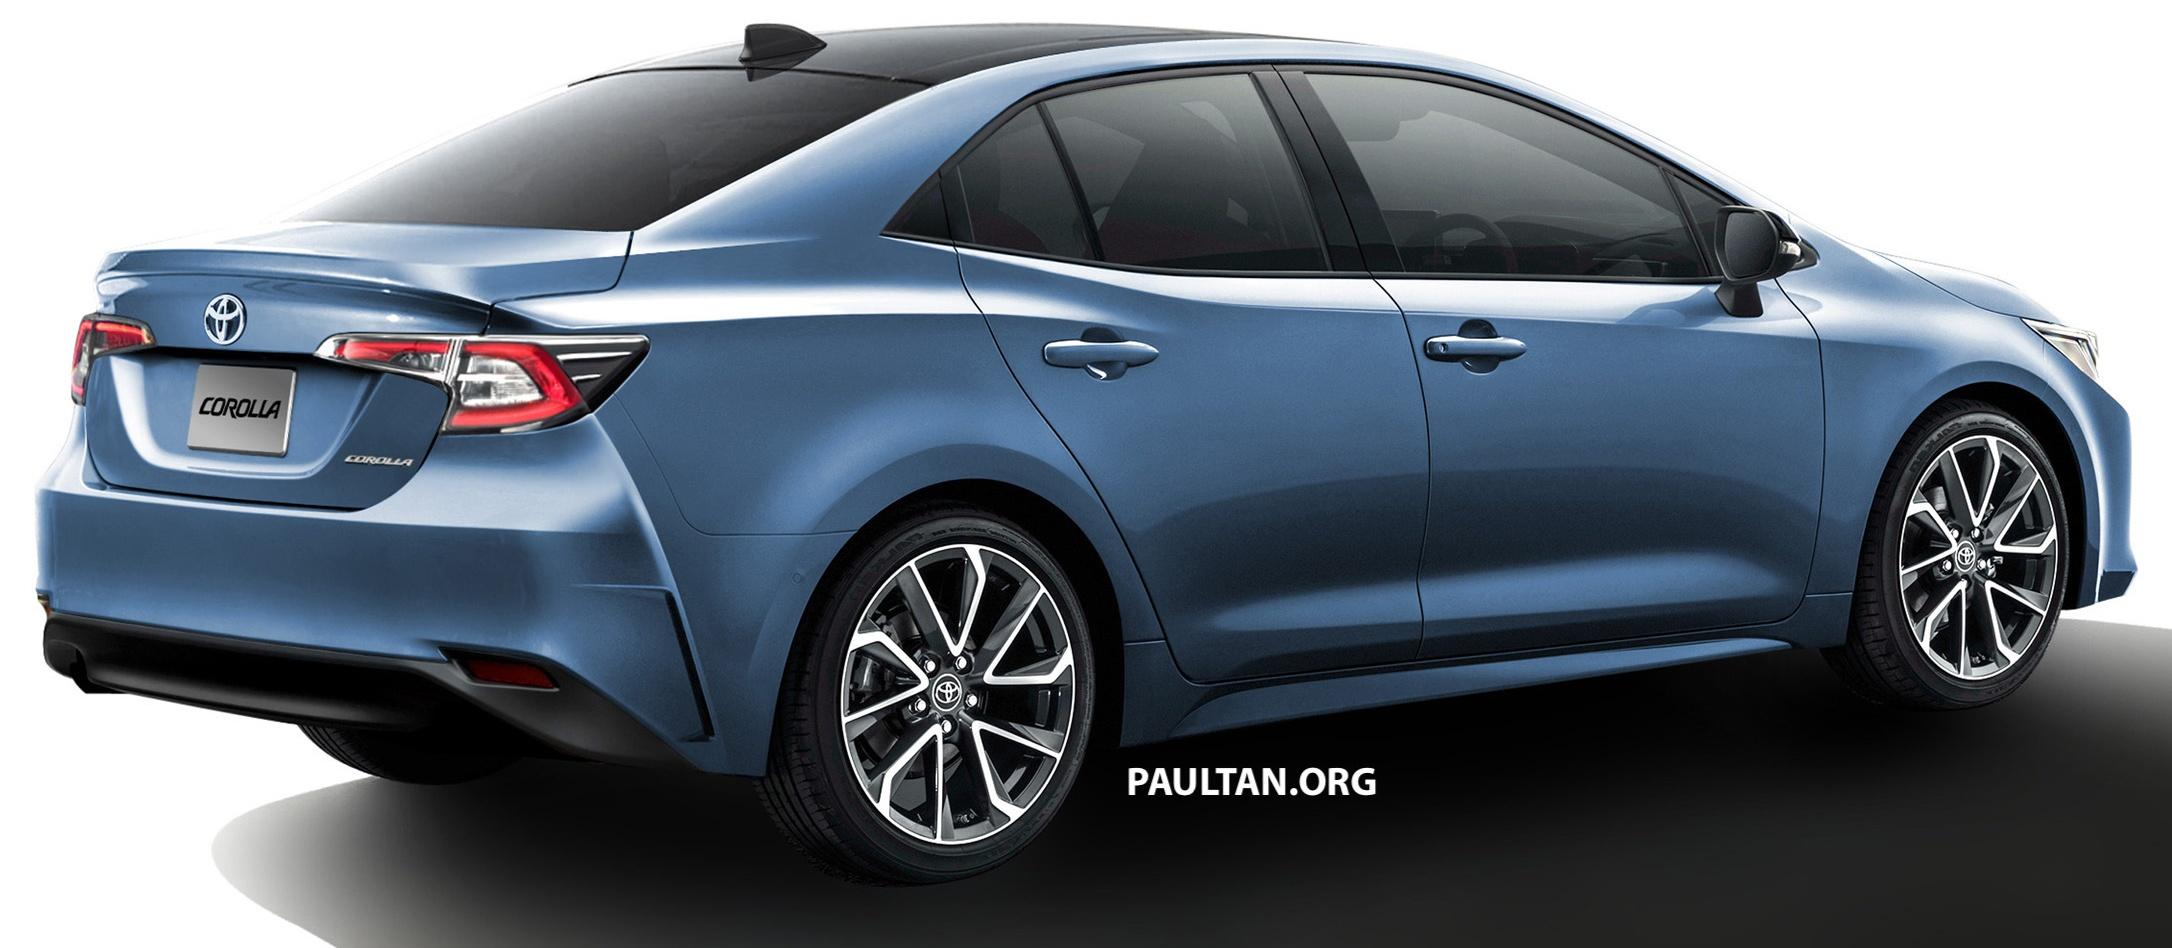 Toyota Corolla Sedan Rendered Based On Auris Hatch World Blogs